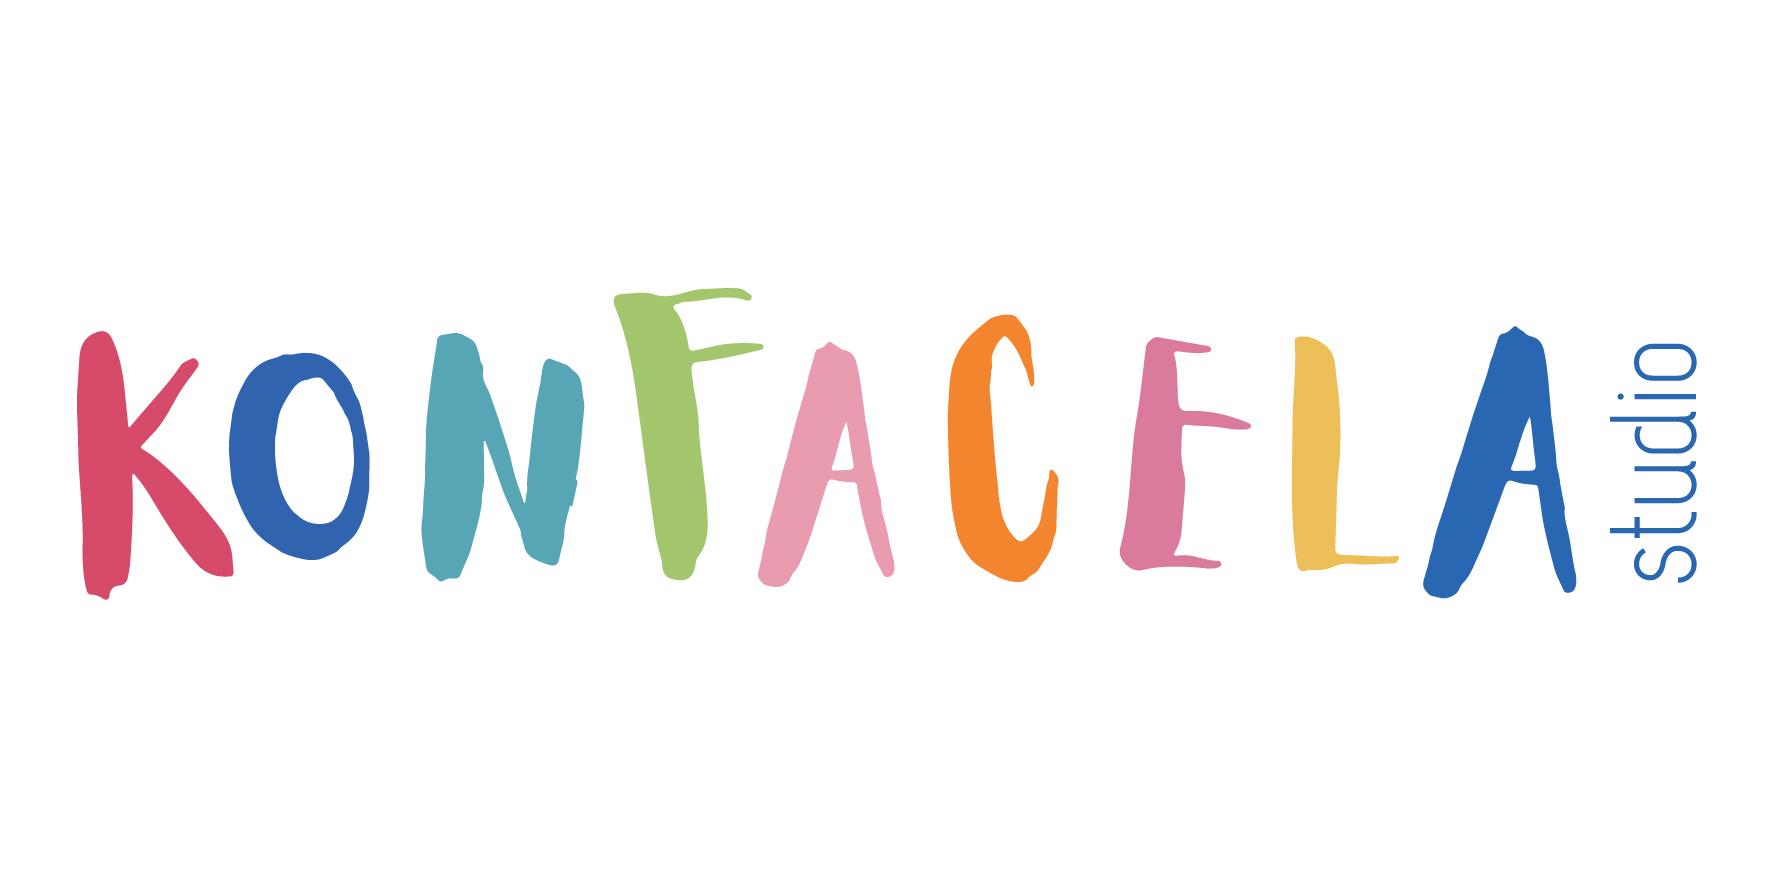 Konfacela_logo-03.jpg